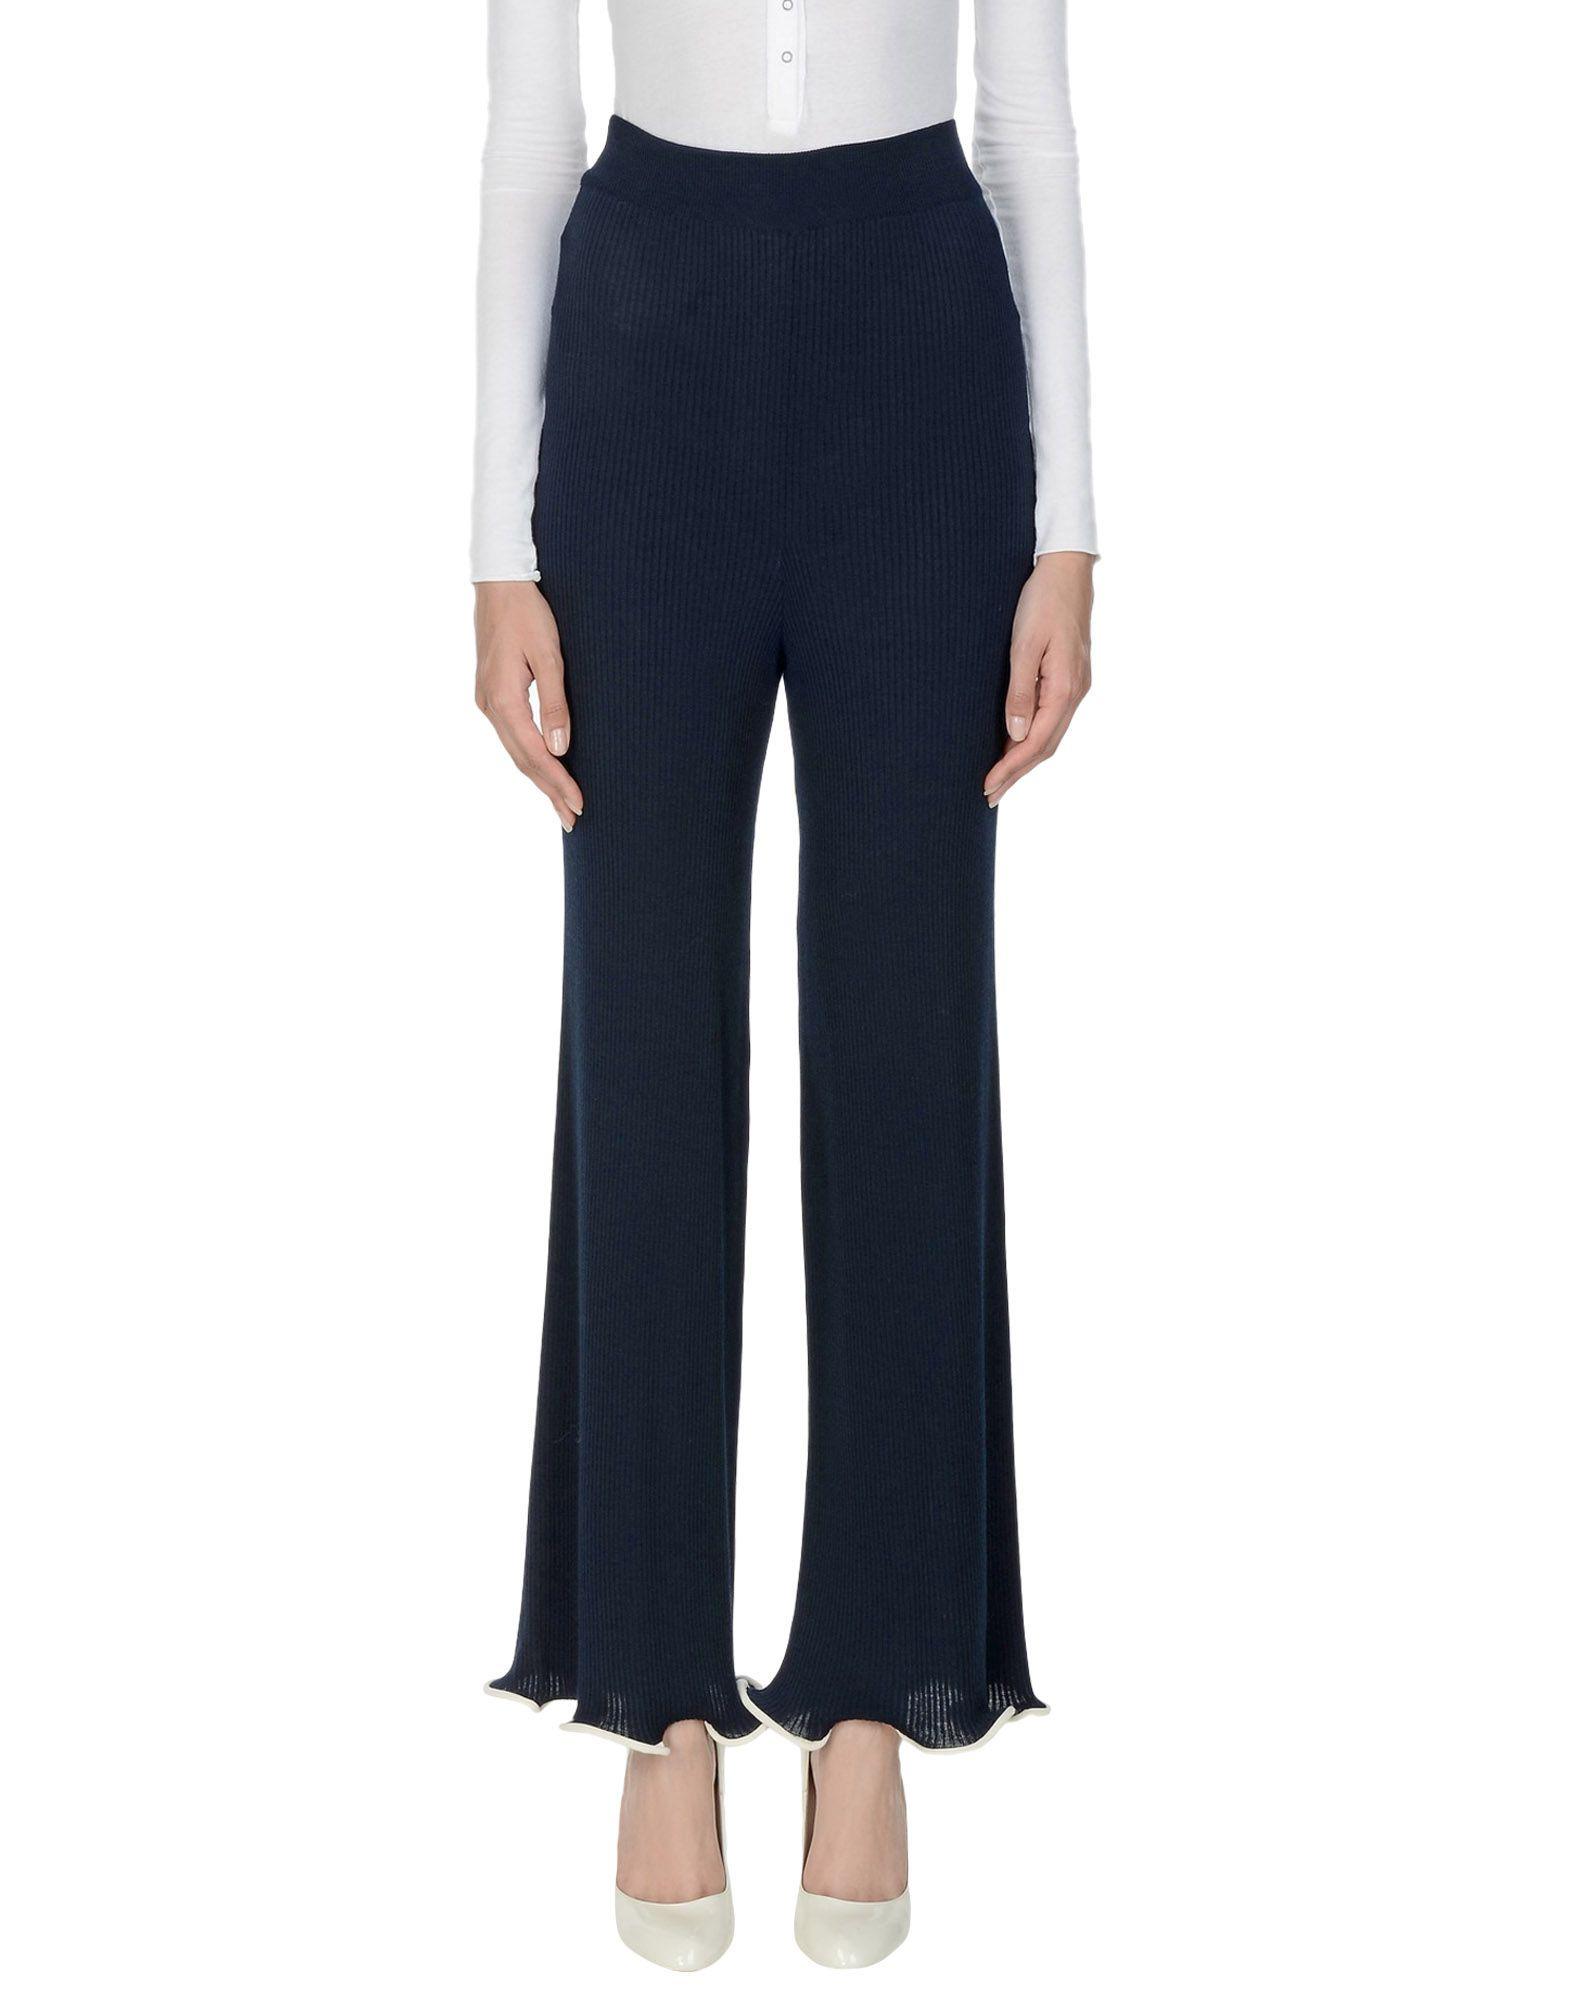 Pantalone Stella Mccartney damen - 13197197MJ